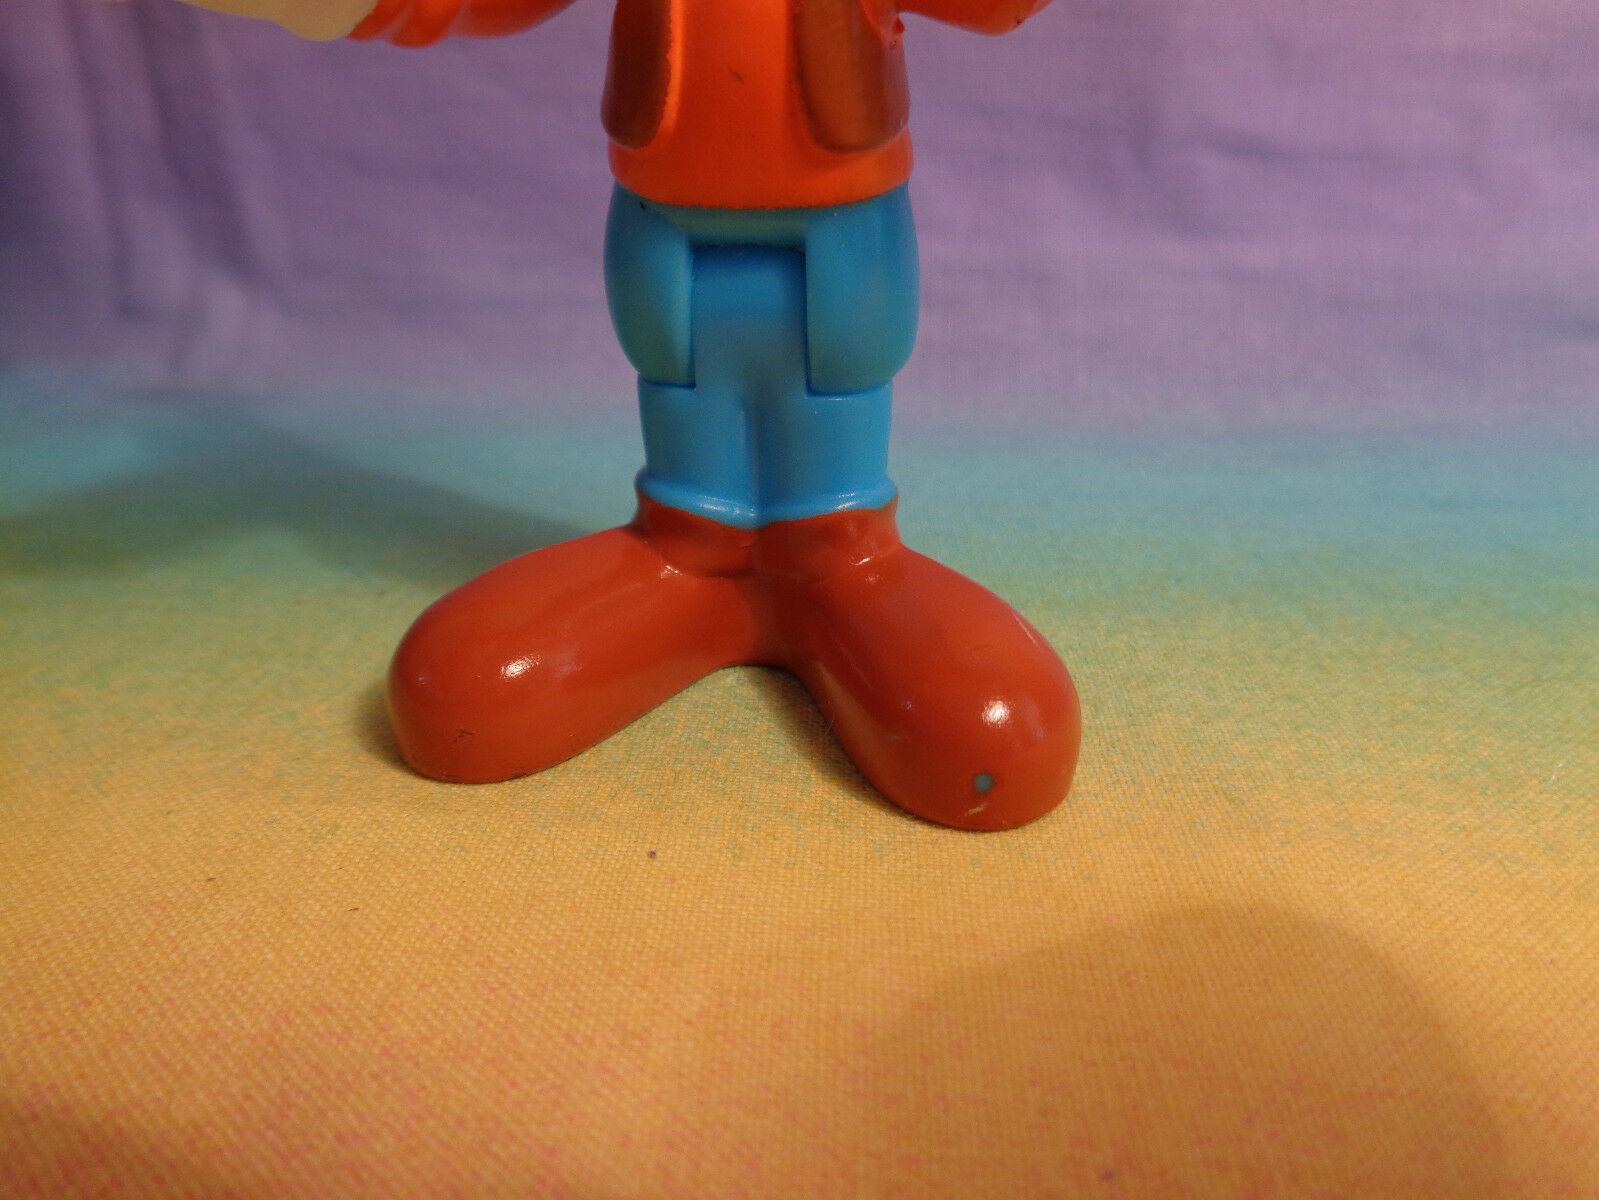 2013 Mattel Disney Bendable at Waist Goofy Figure - as is - scraped